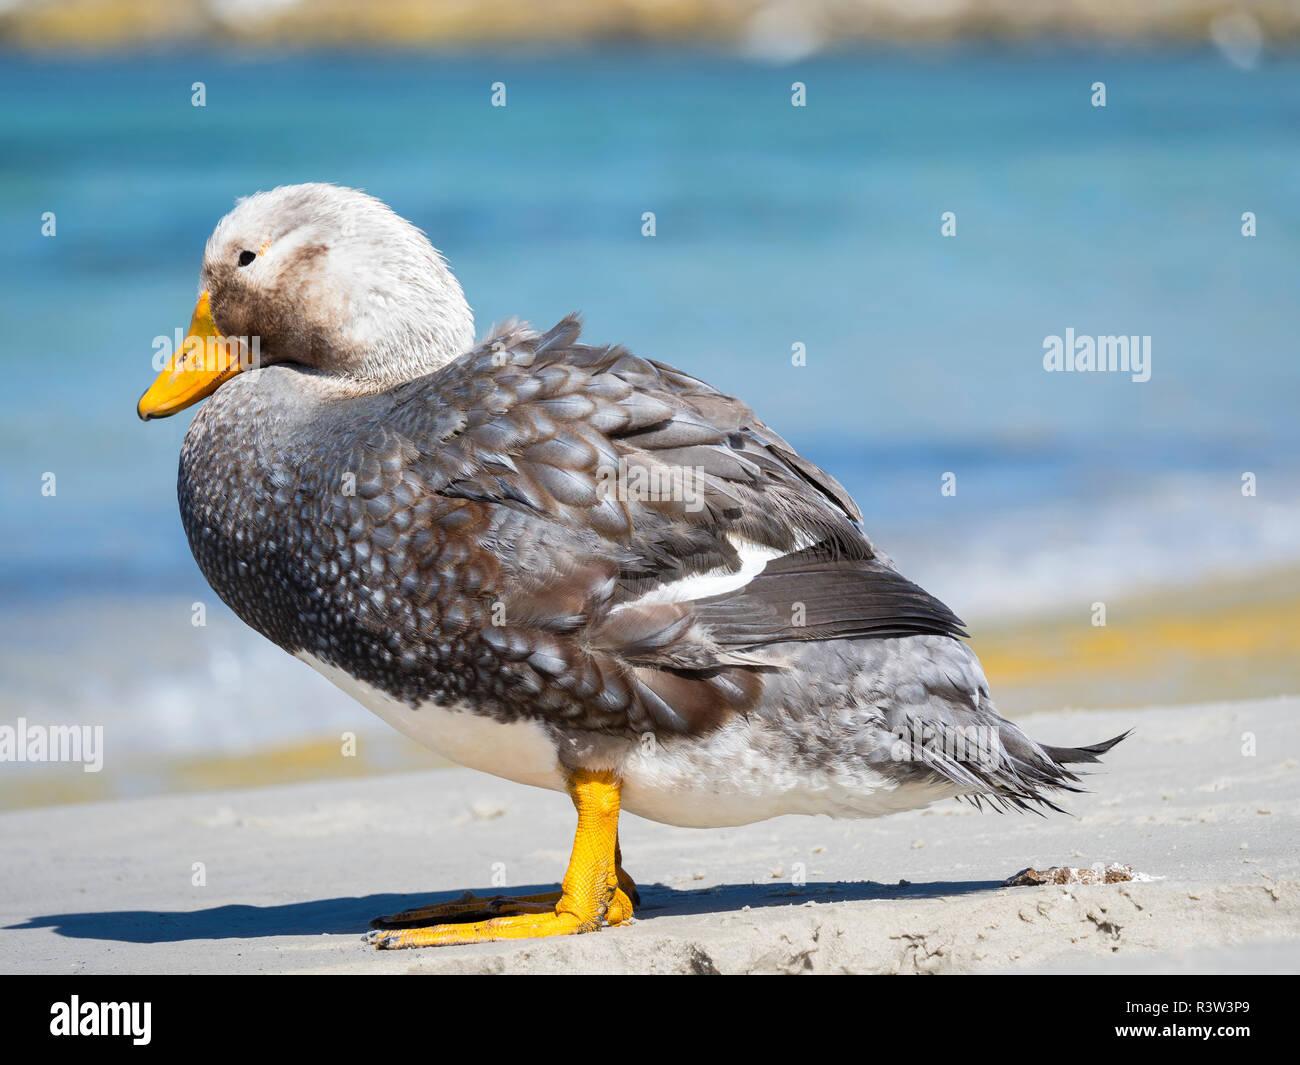 Male Falkland flightless Steamer duck (Tachyeres brachypterus) endemic to the Falkland Islands. - Stock Image